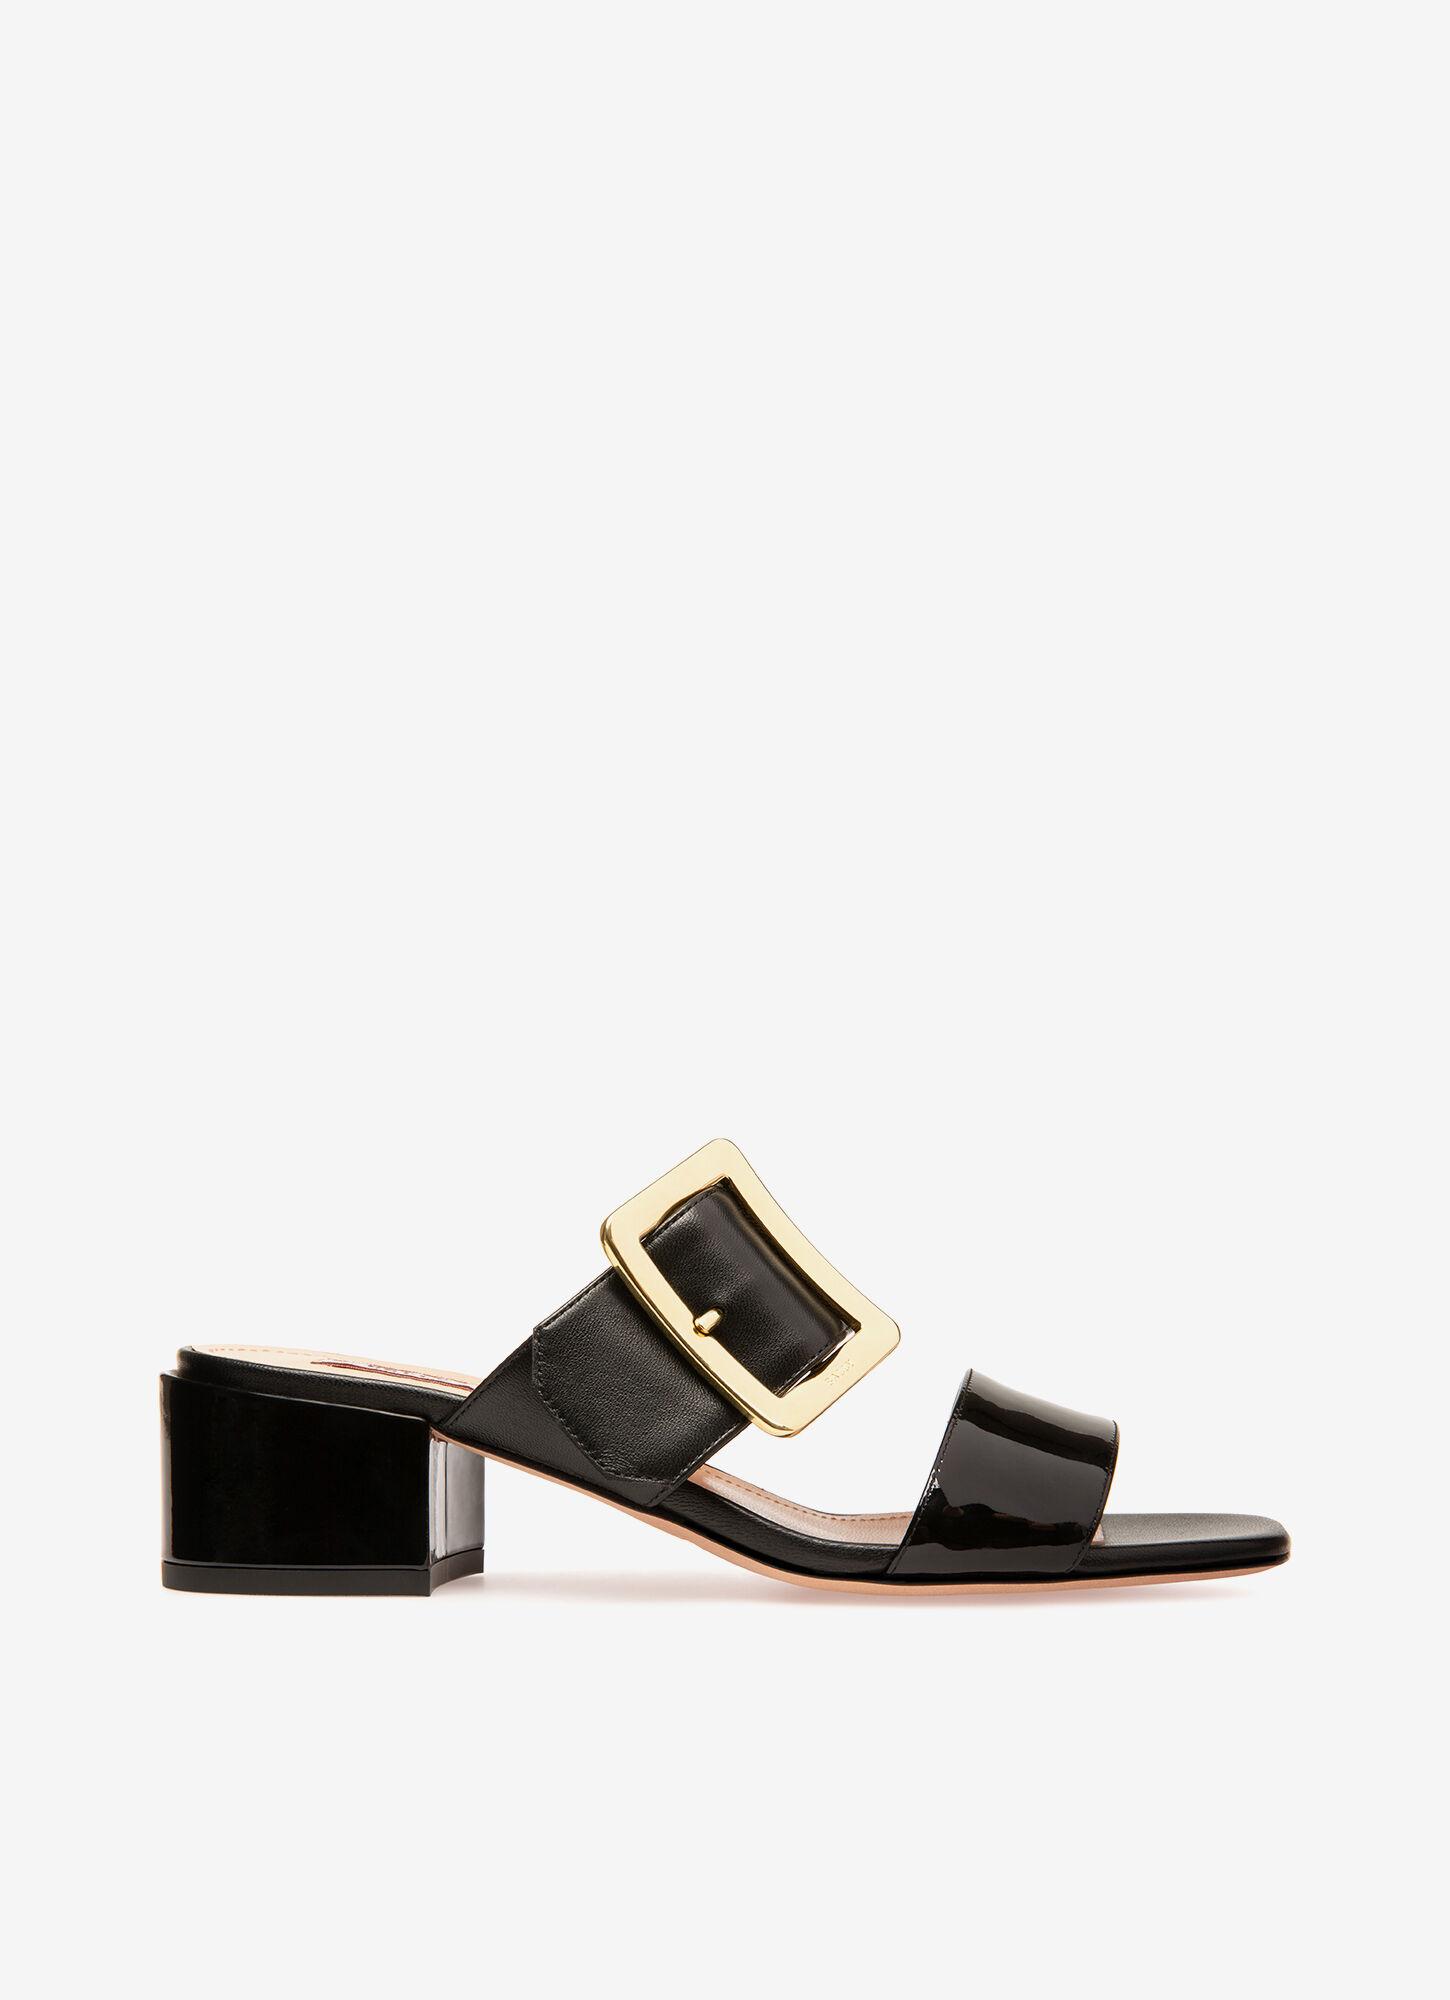 Jeny  Womens Mule Sandals   Black